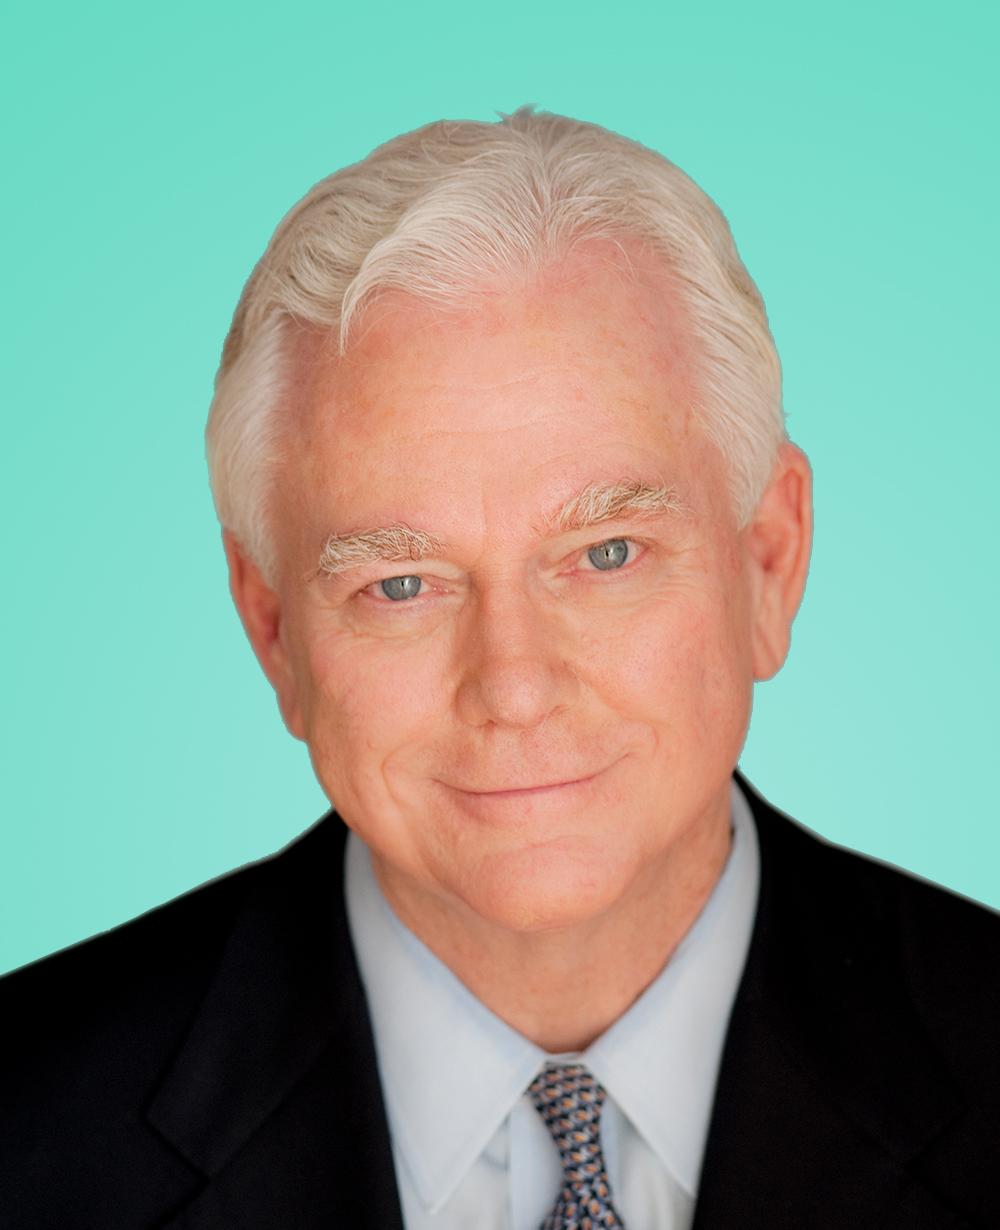 Robert-Watkins-Photo-1.jpg